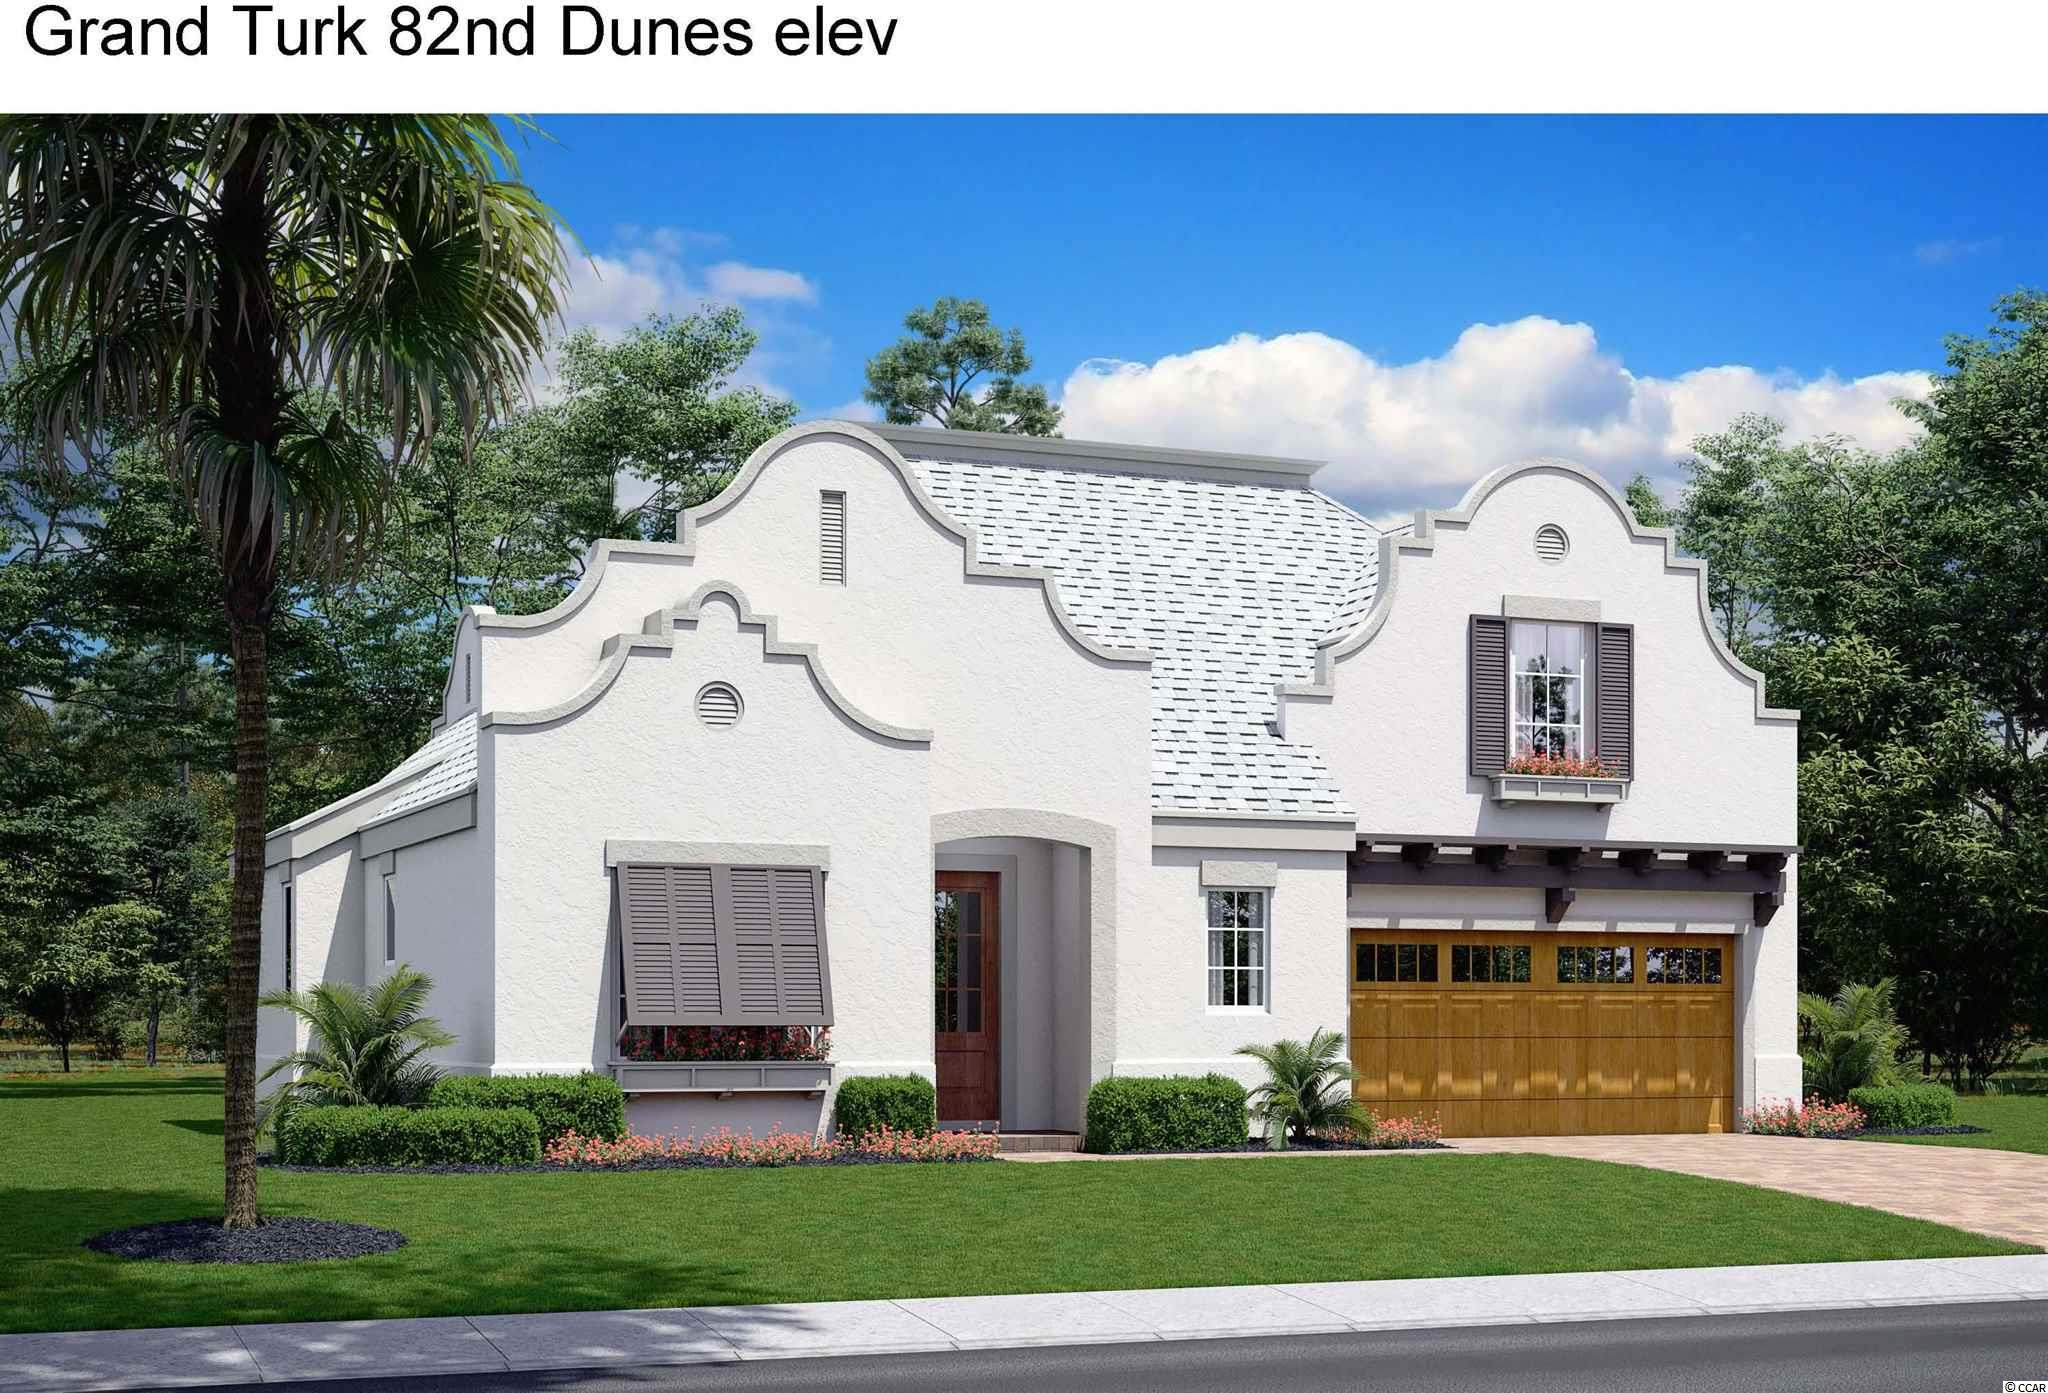 82 Dunes Real Estate Listings Main Image